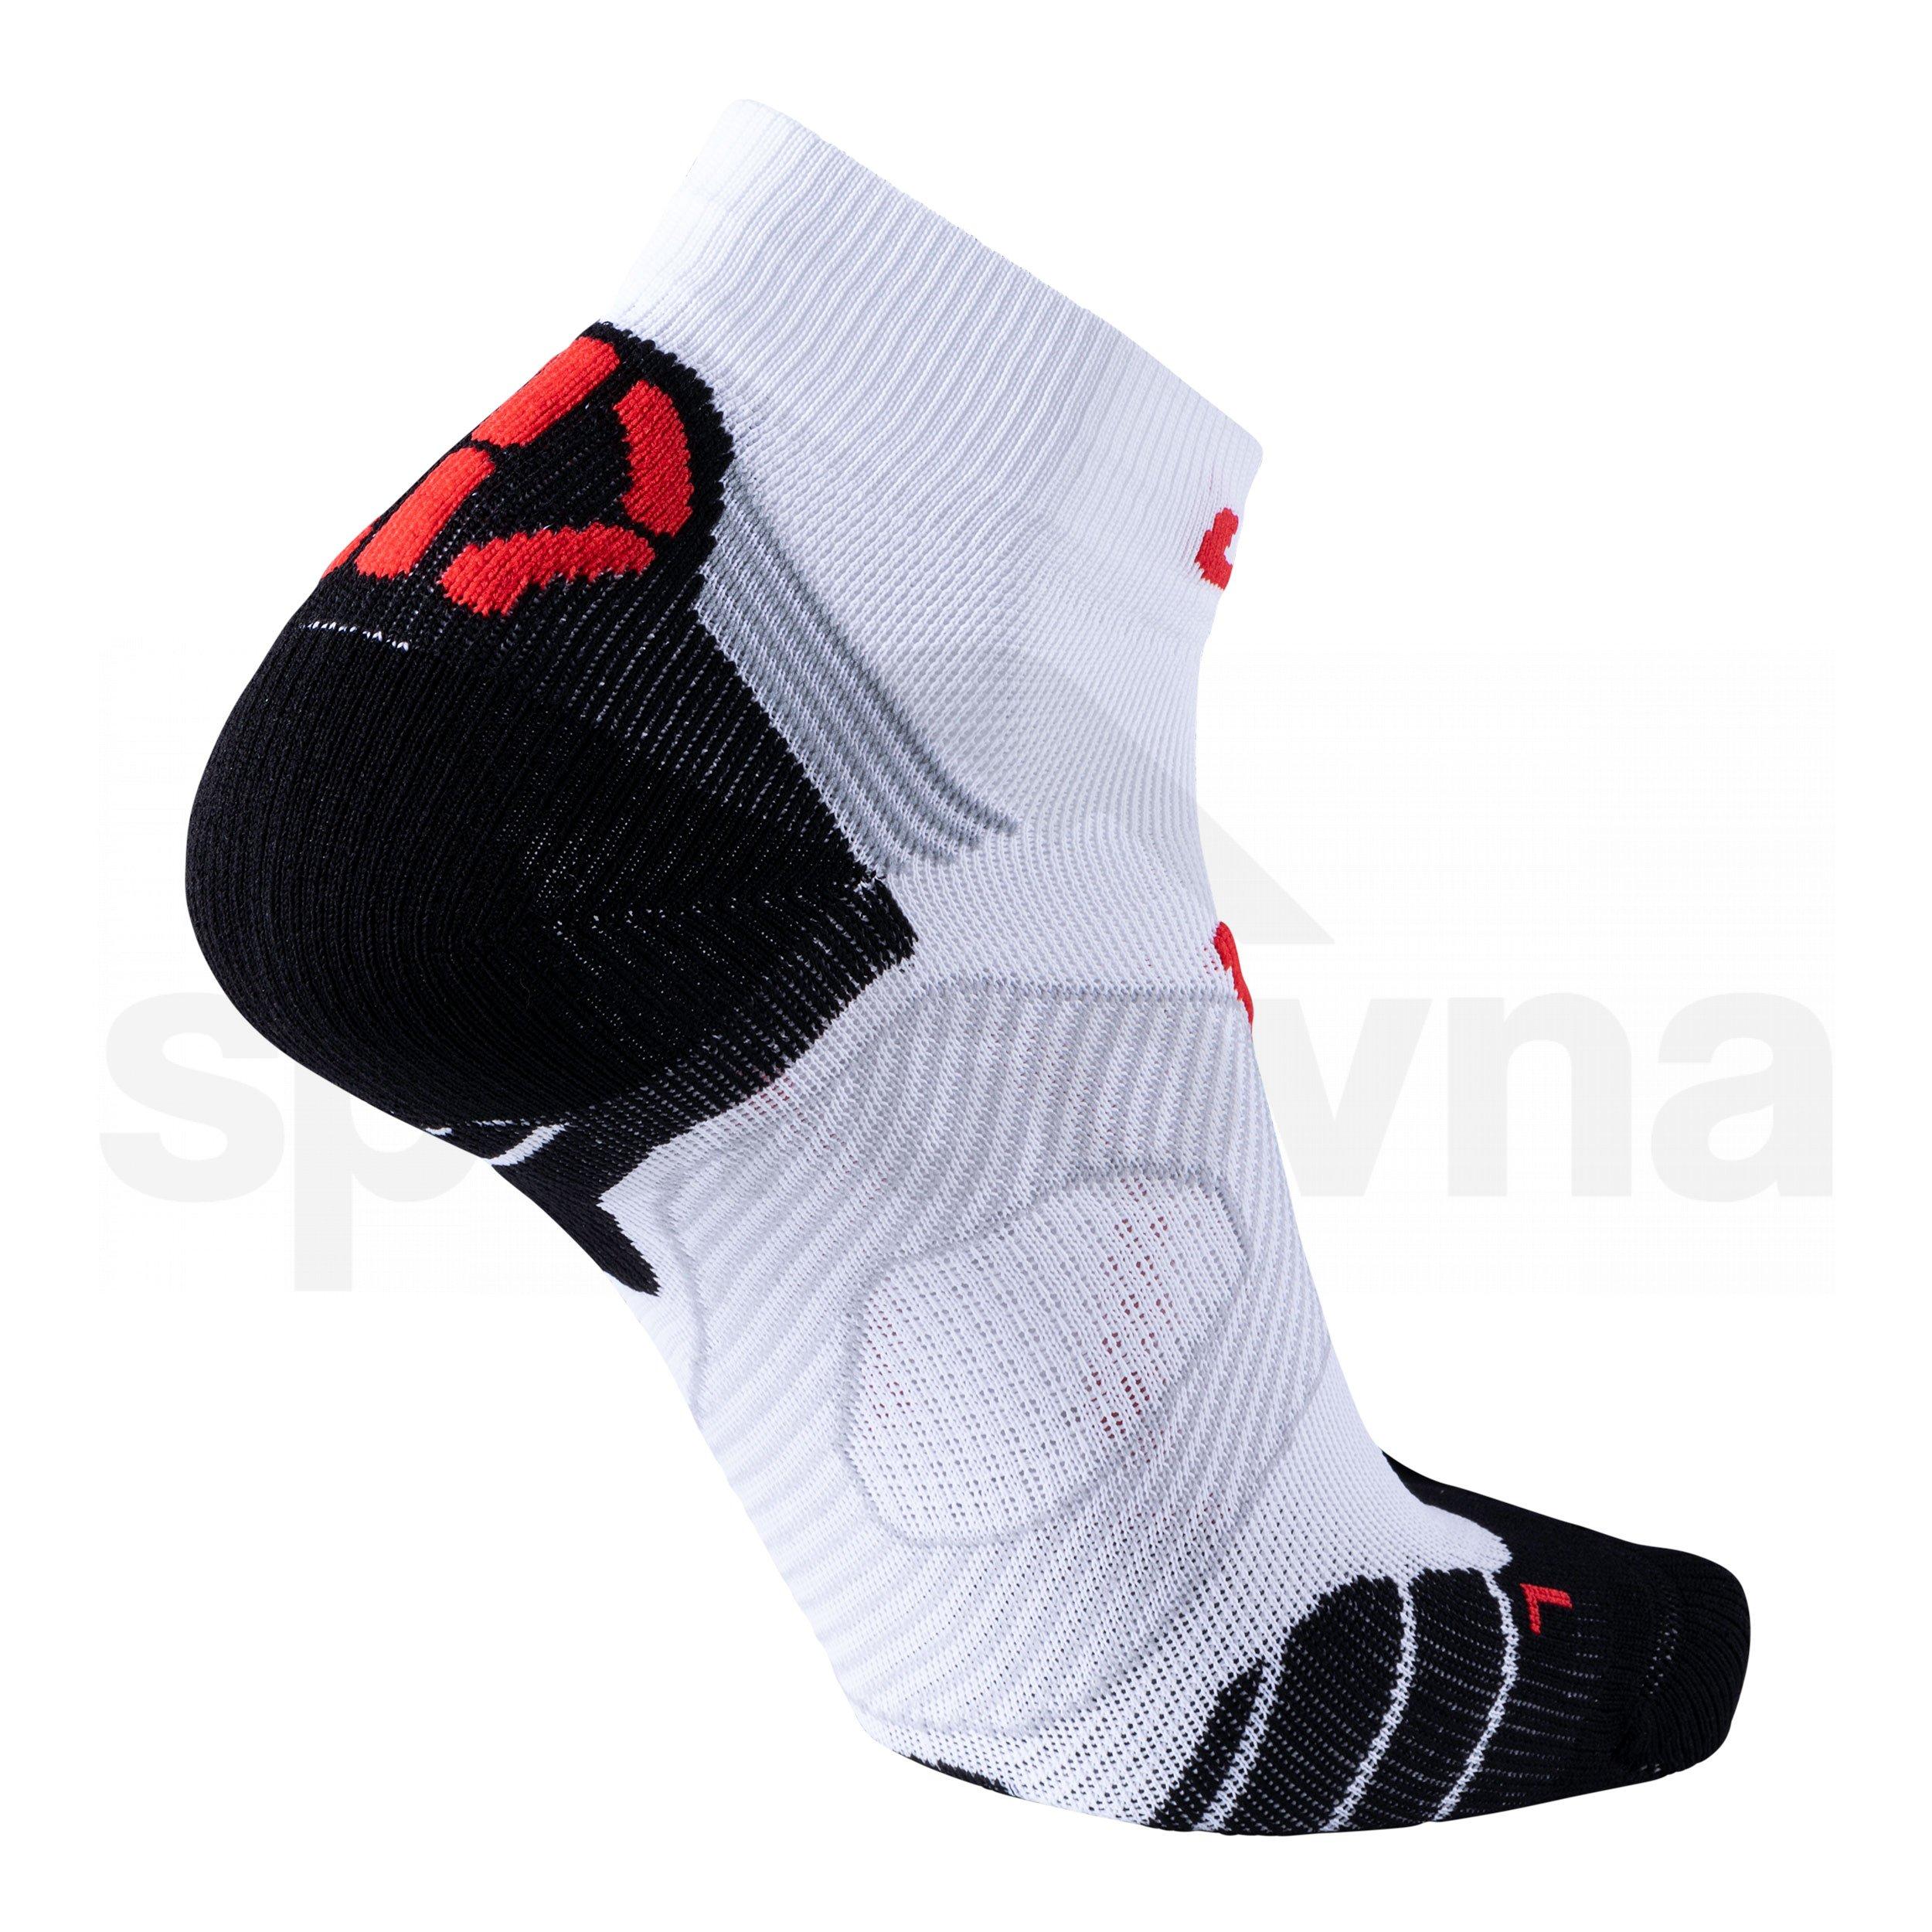 Pánské ponožky UYN RUN SUPER FAST SOCKS - bílá/červená